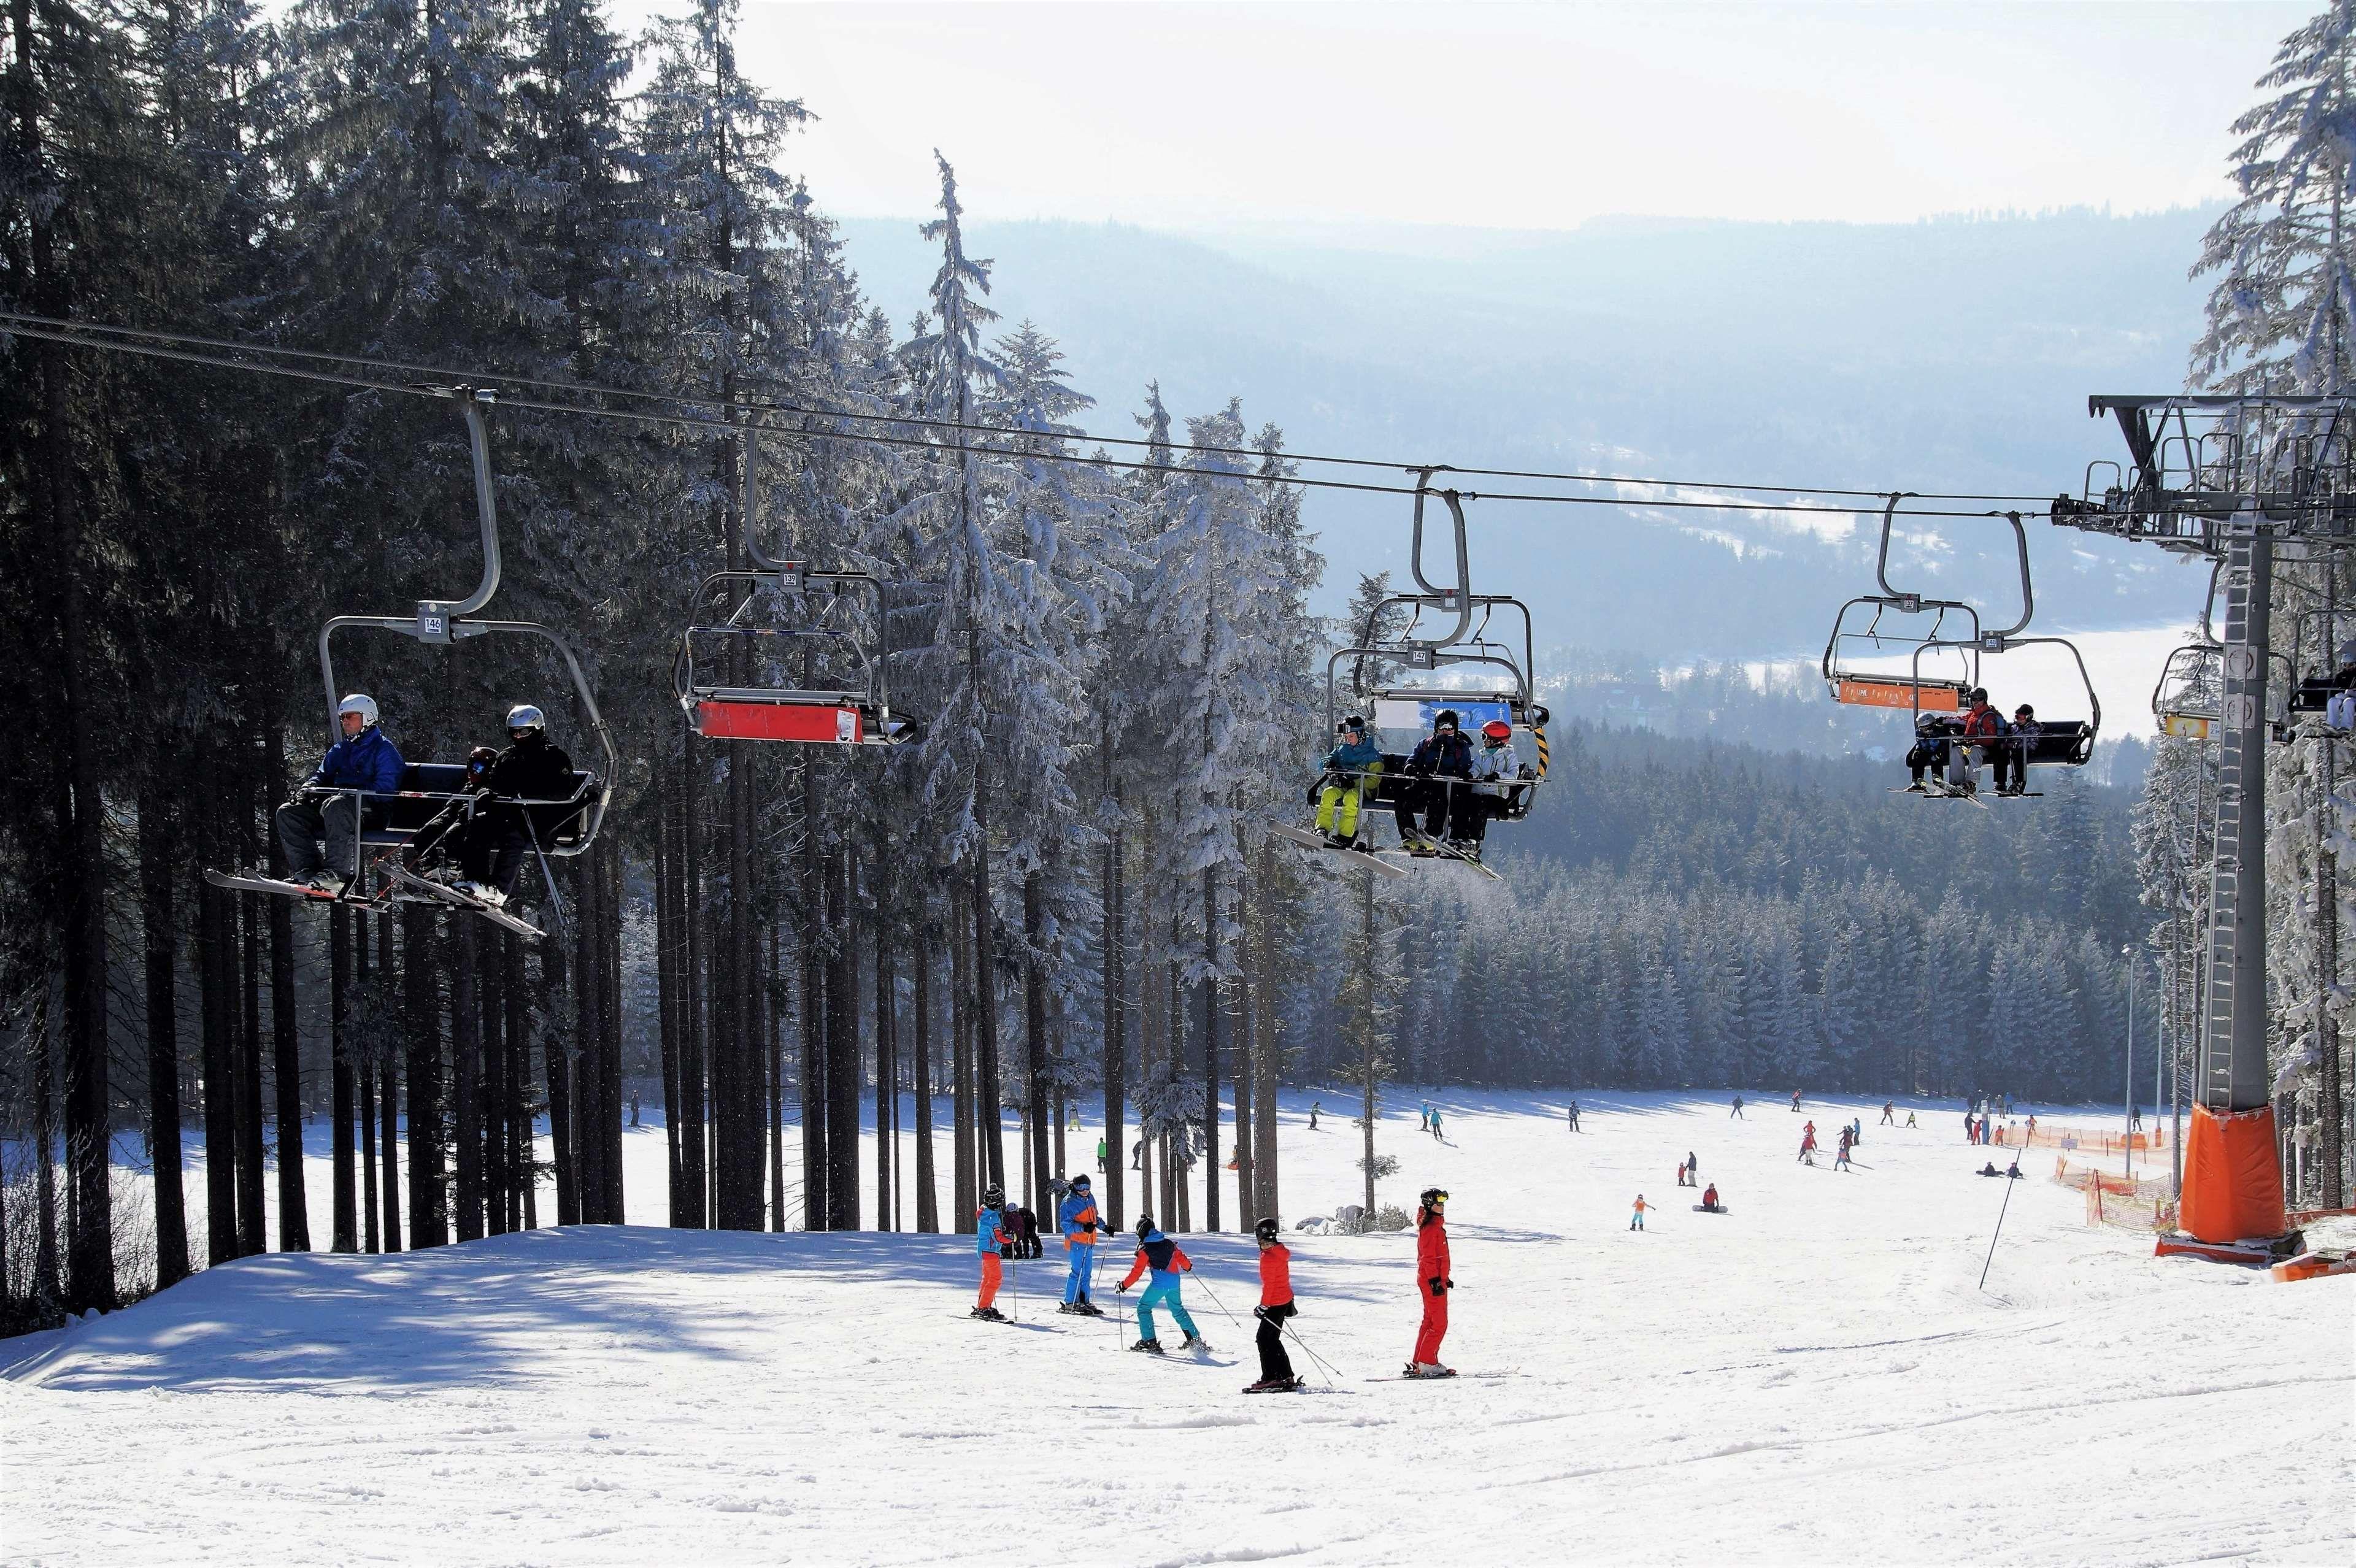 Chair Lift Lipno Mountains Ski Areal Ski Resort Skiers Skiing Area Umava The Ski Slope Trees Winter Winter Sport Ski Resort Ski Area Skiing